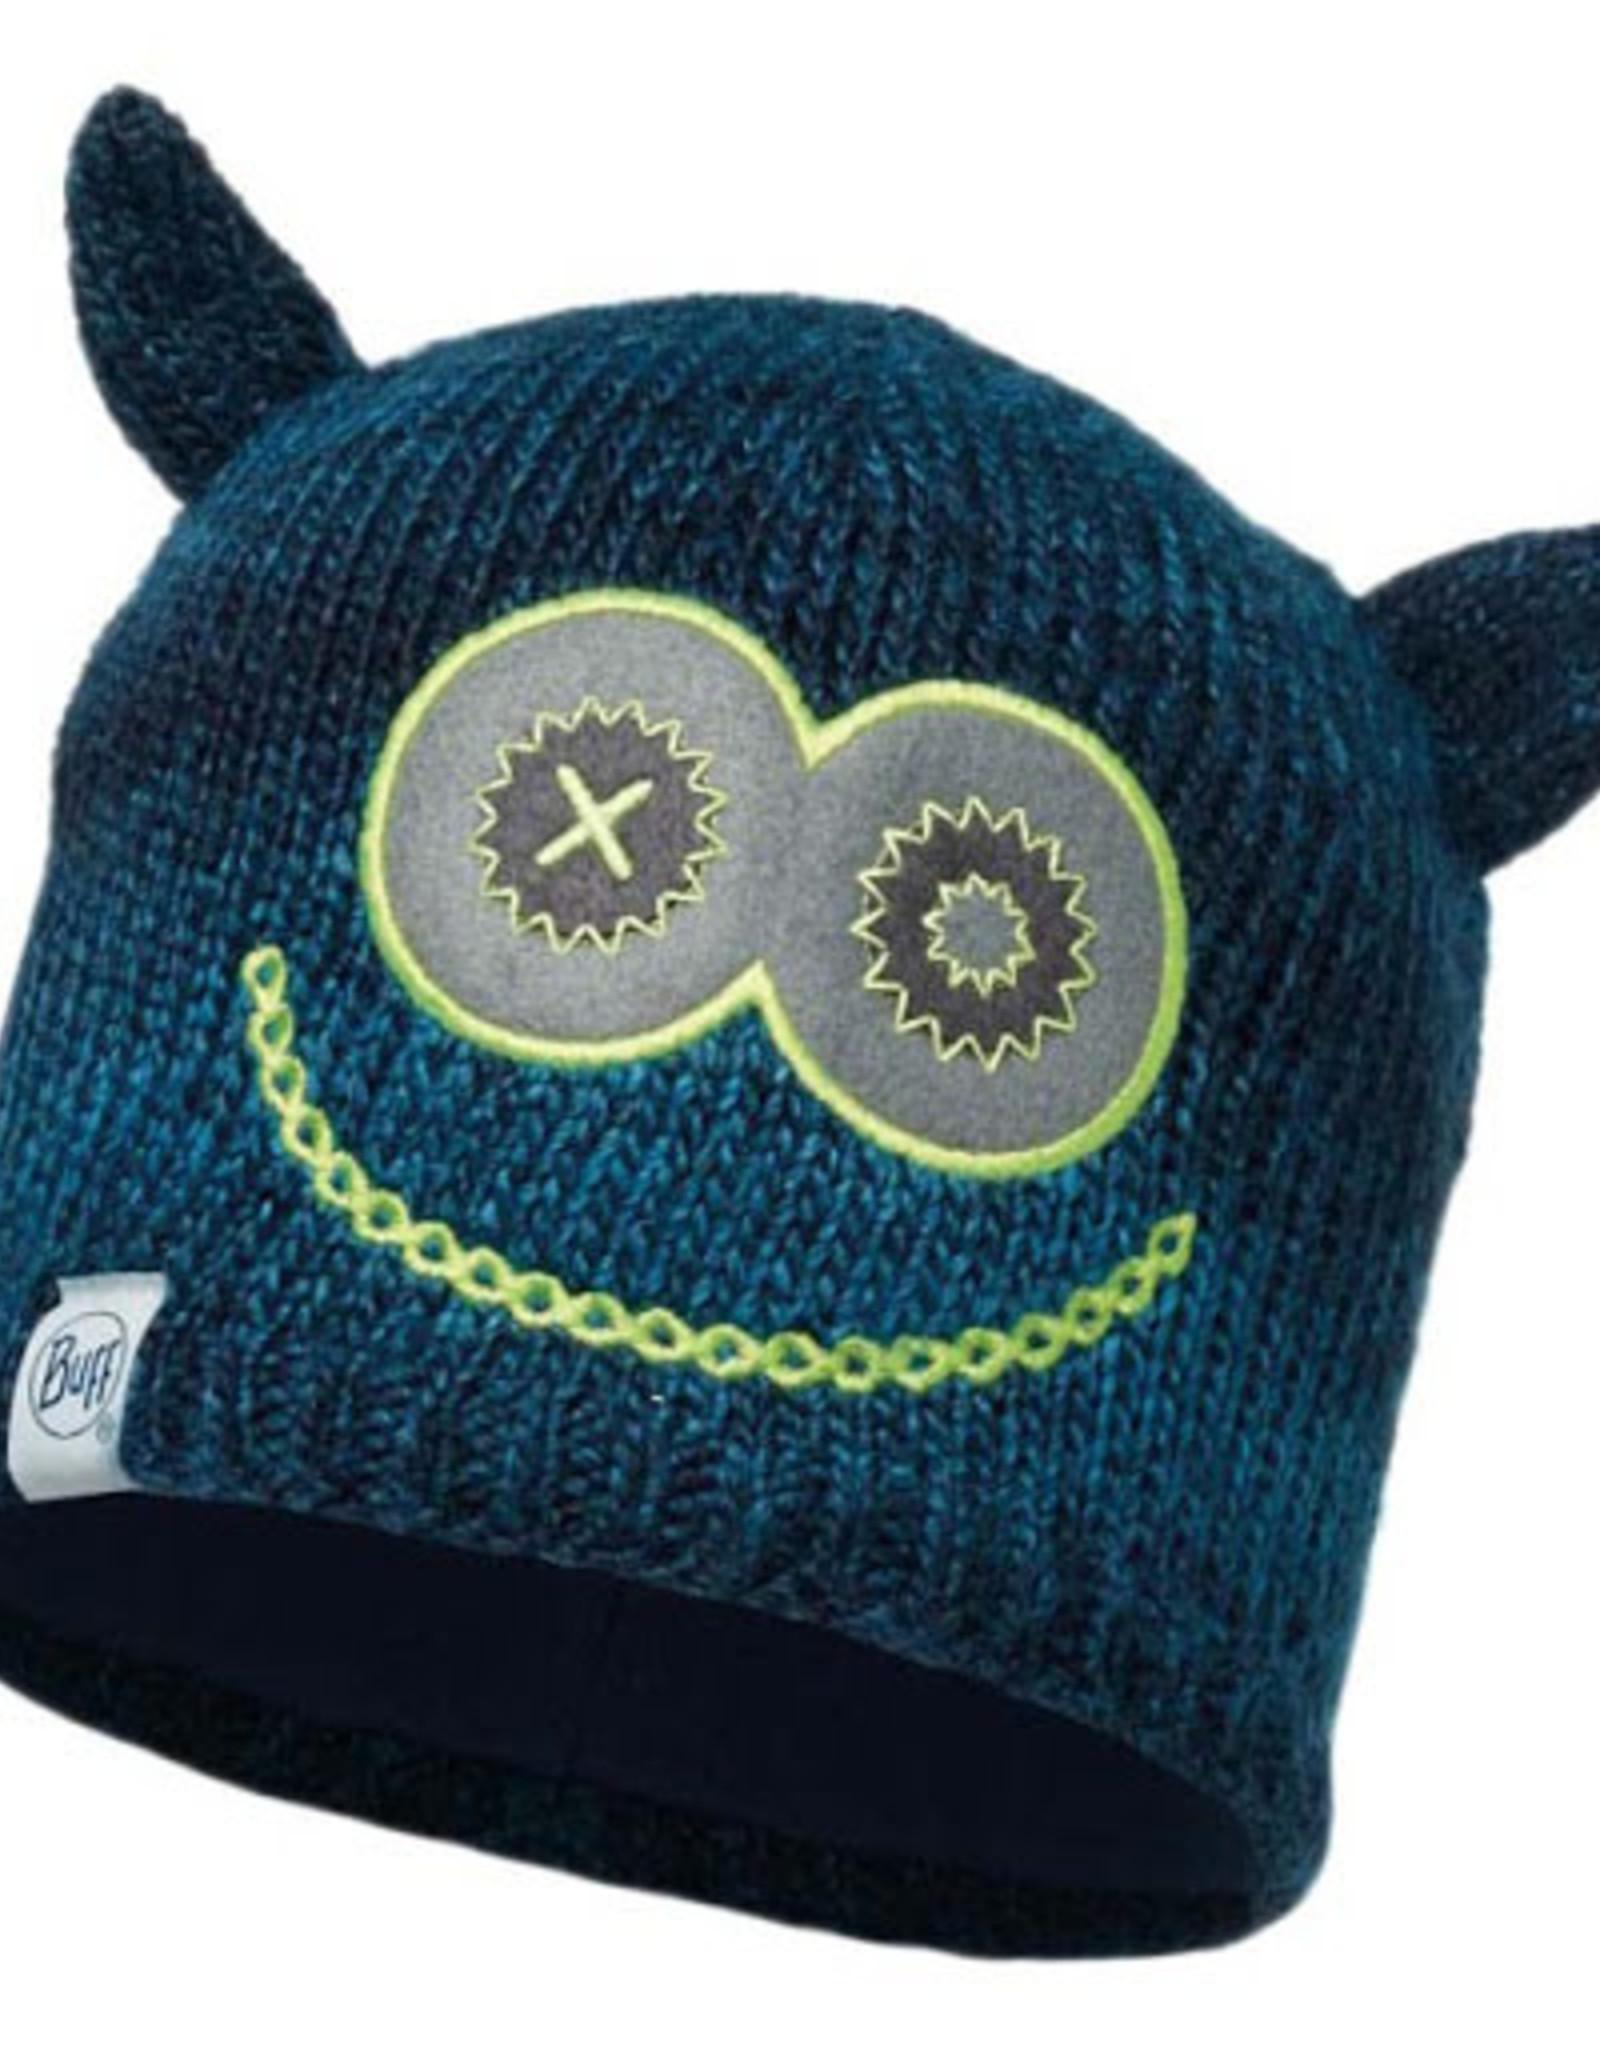 BUFF Monster Dark Navy - Child Knitted & Polar Hat BUFF®